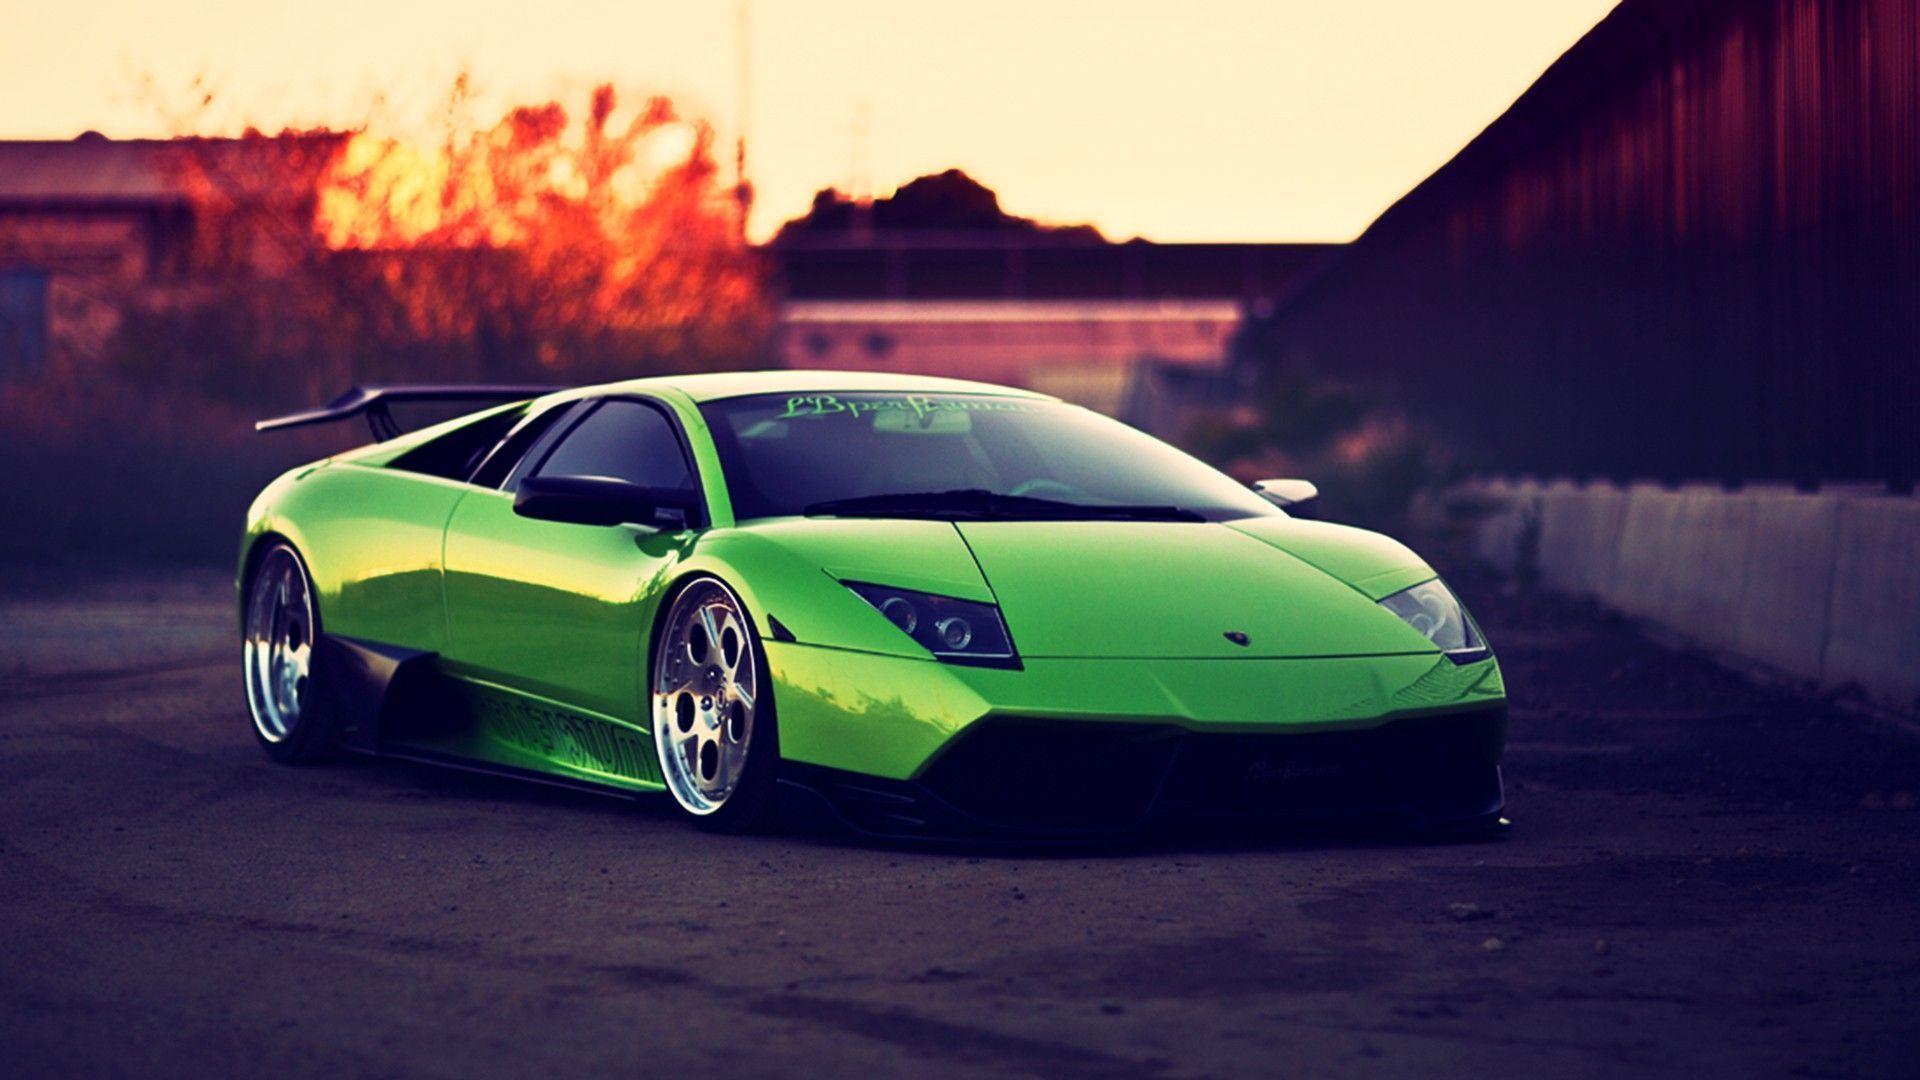 Lamborghini Aventador Latest Wallpapers · Lamborghini Wallpapers ...